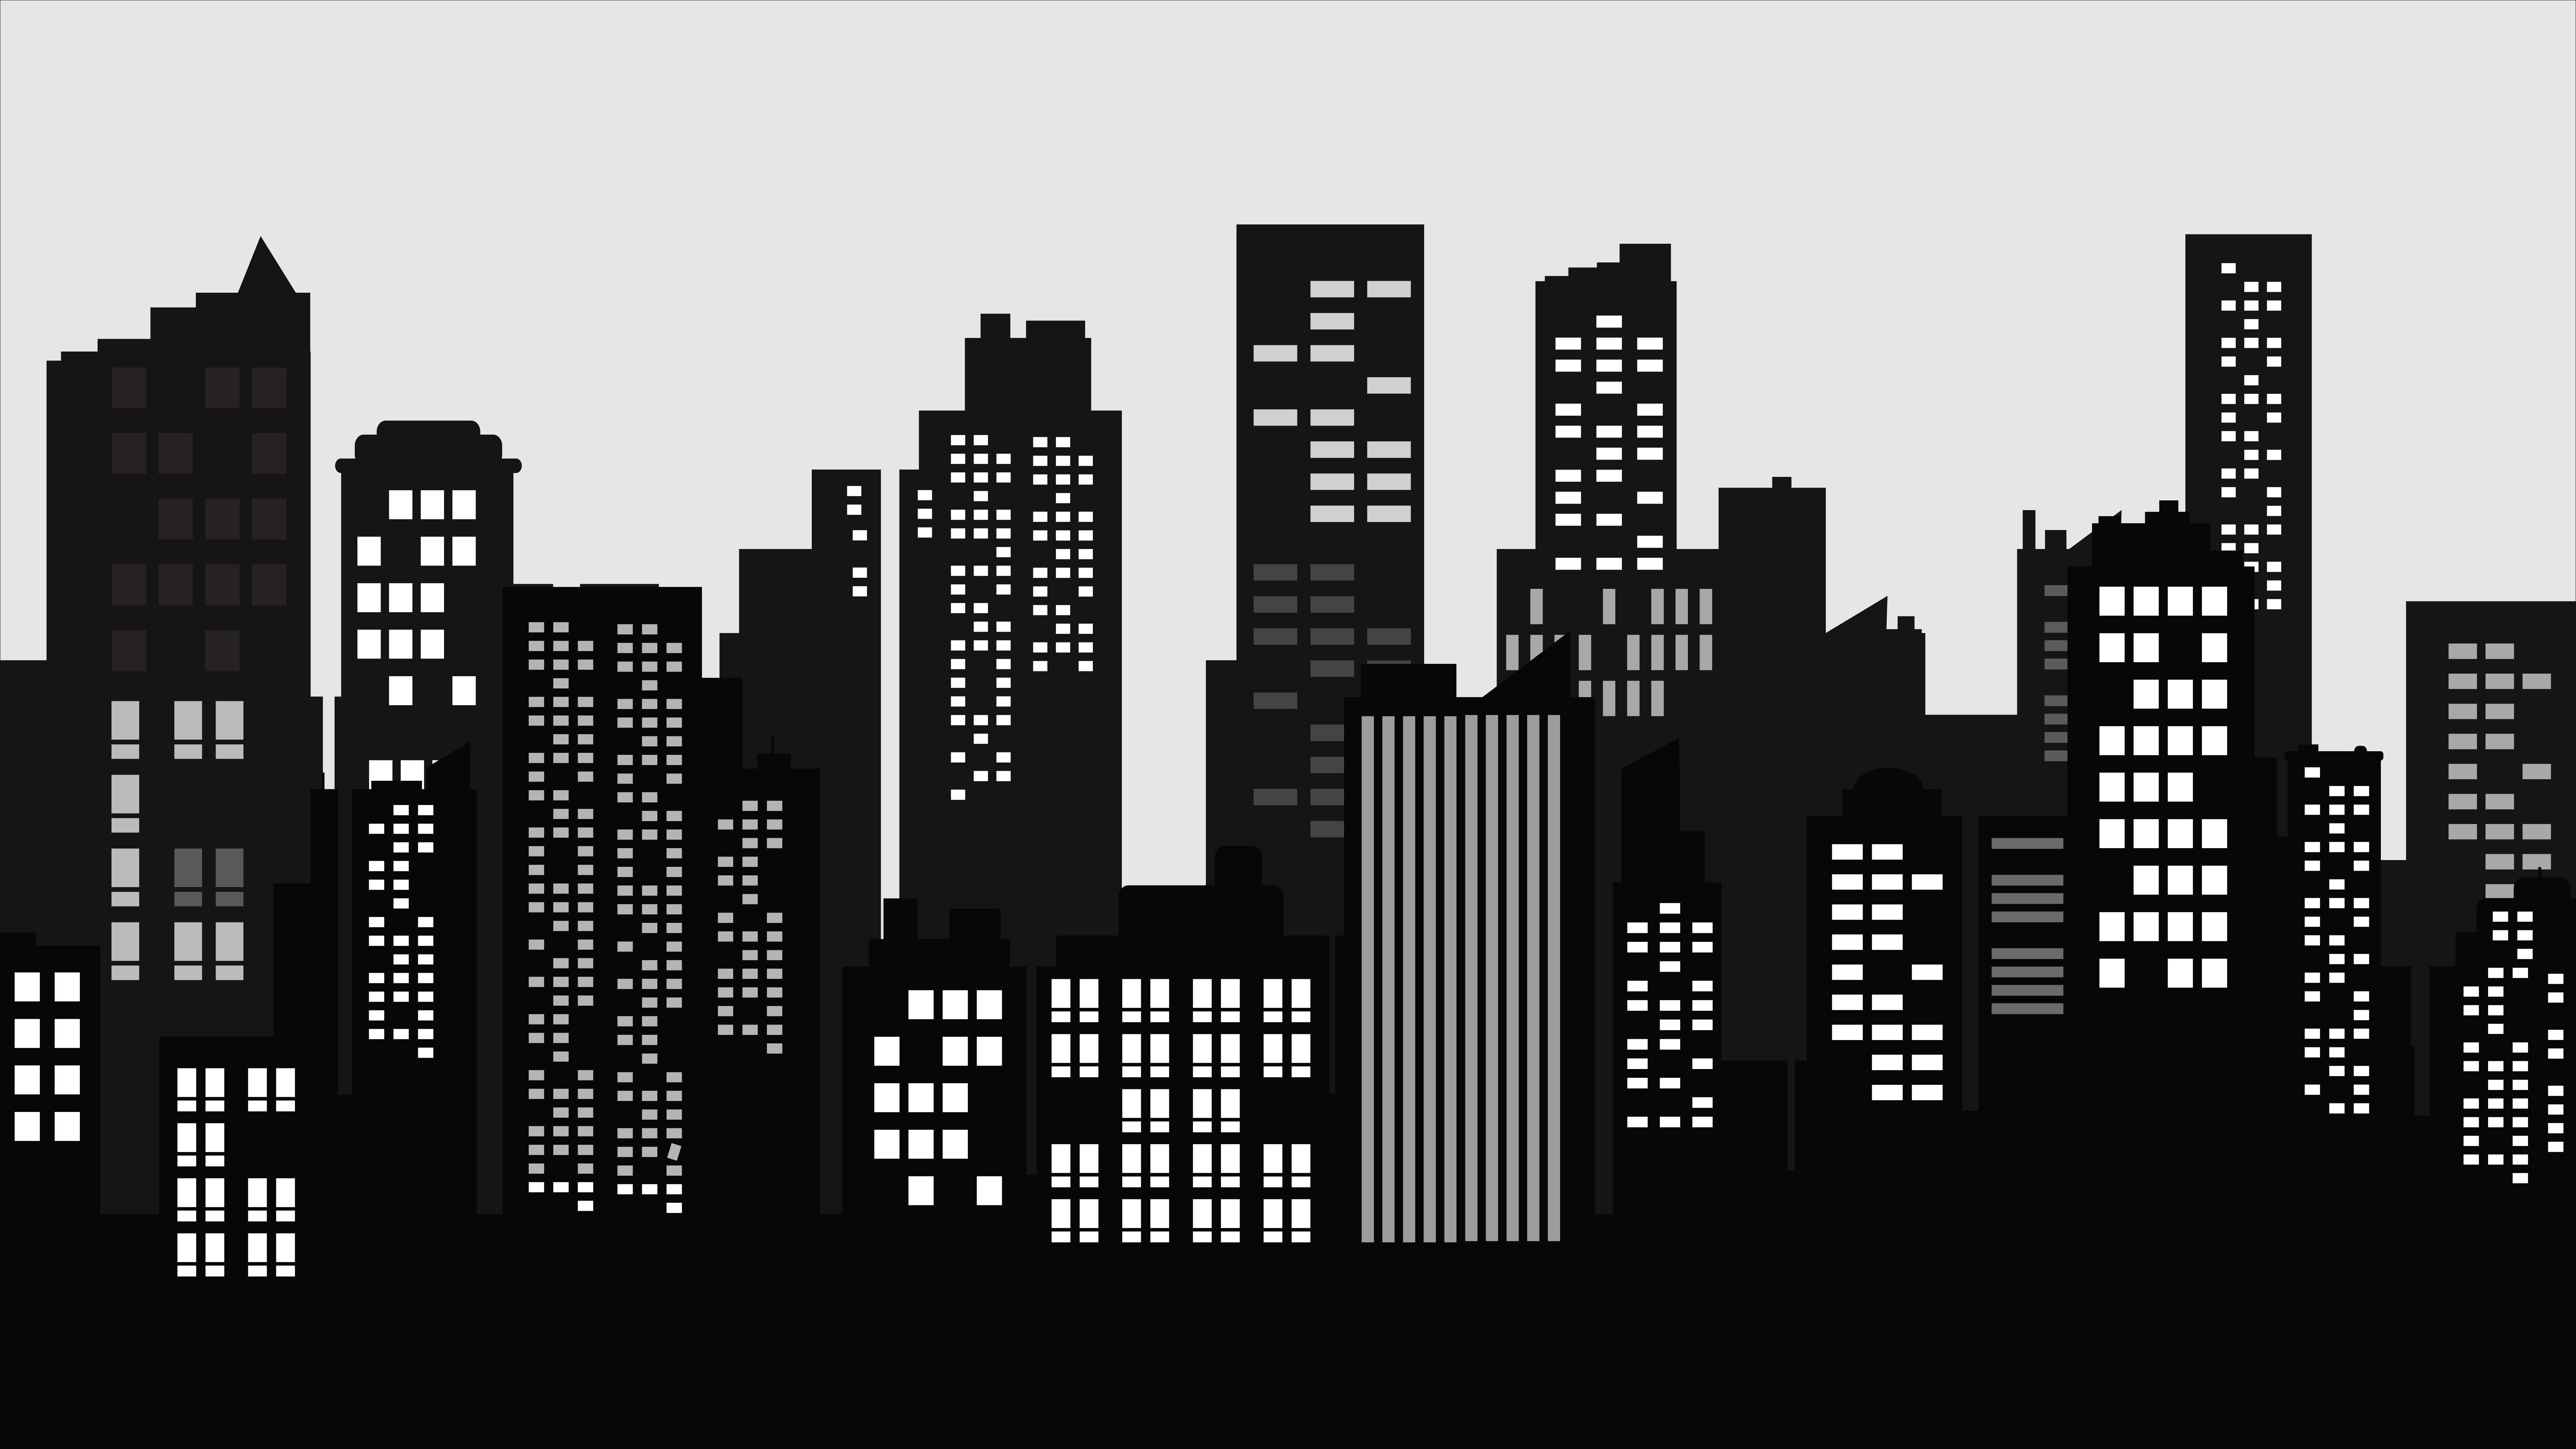 Silhouette City Landscape  Modern Building Architecture